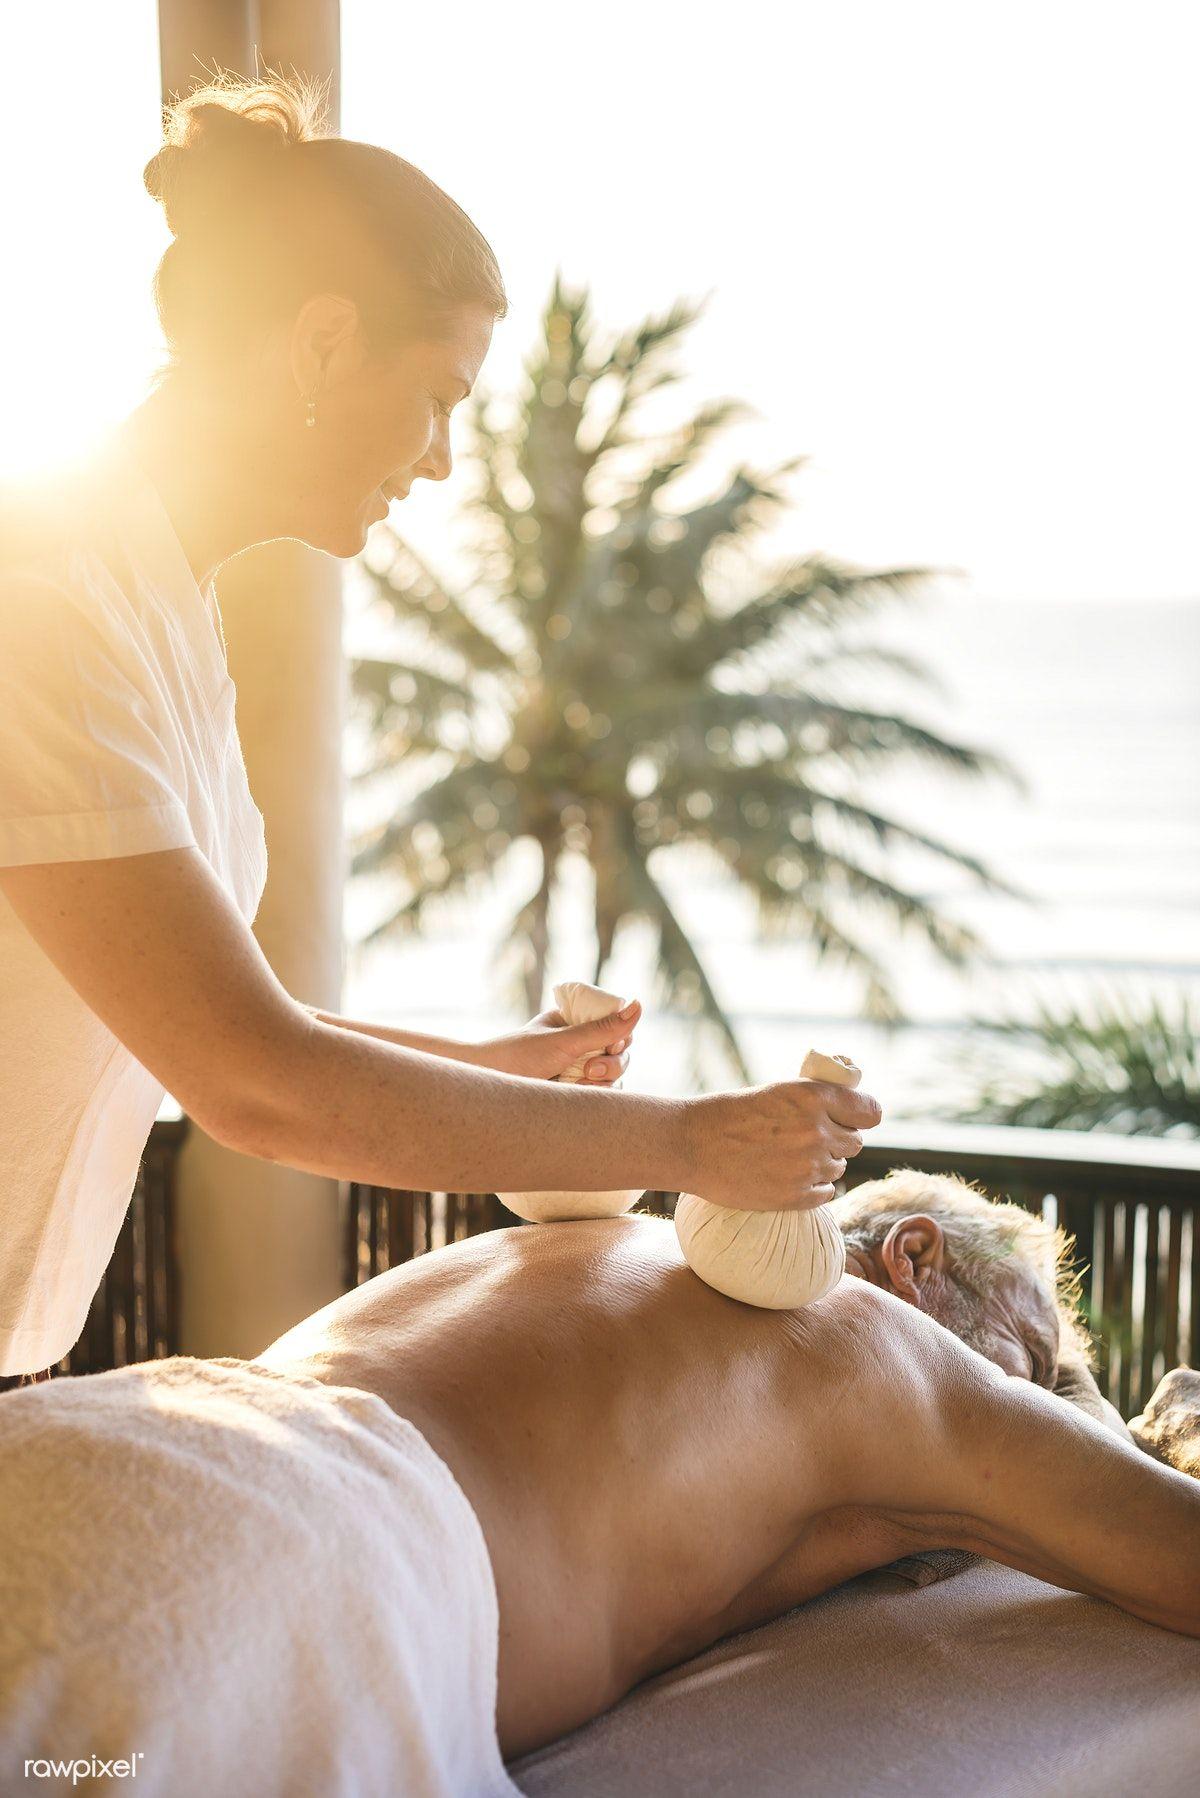 Download premium image of A senior having a massage 418970